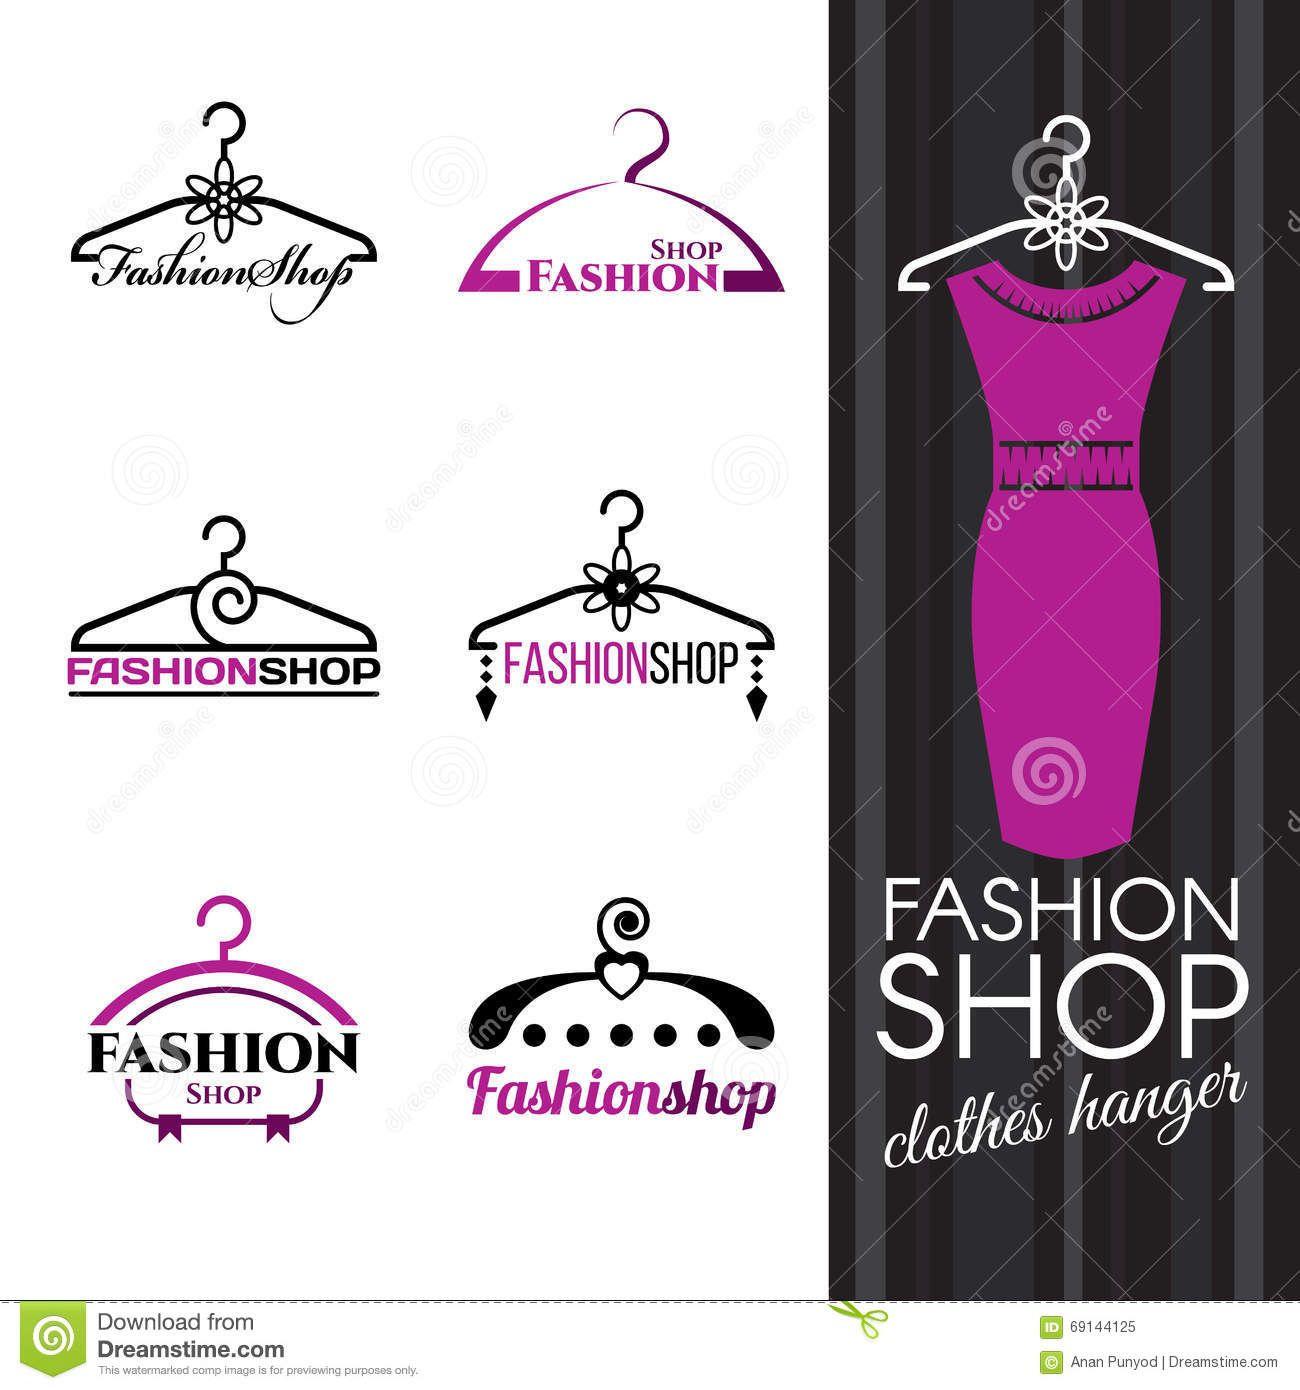 Image result for how to create a hanger logo Hanger logo